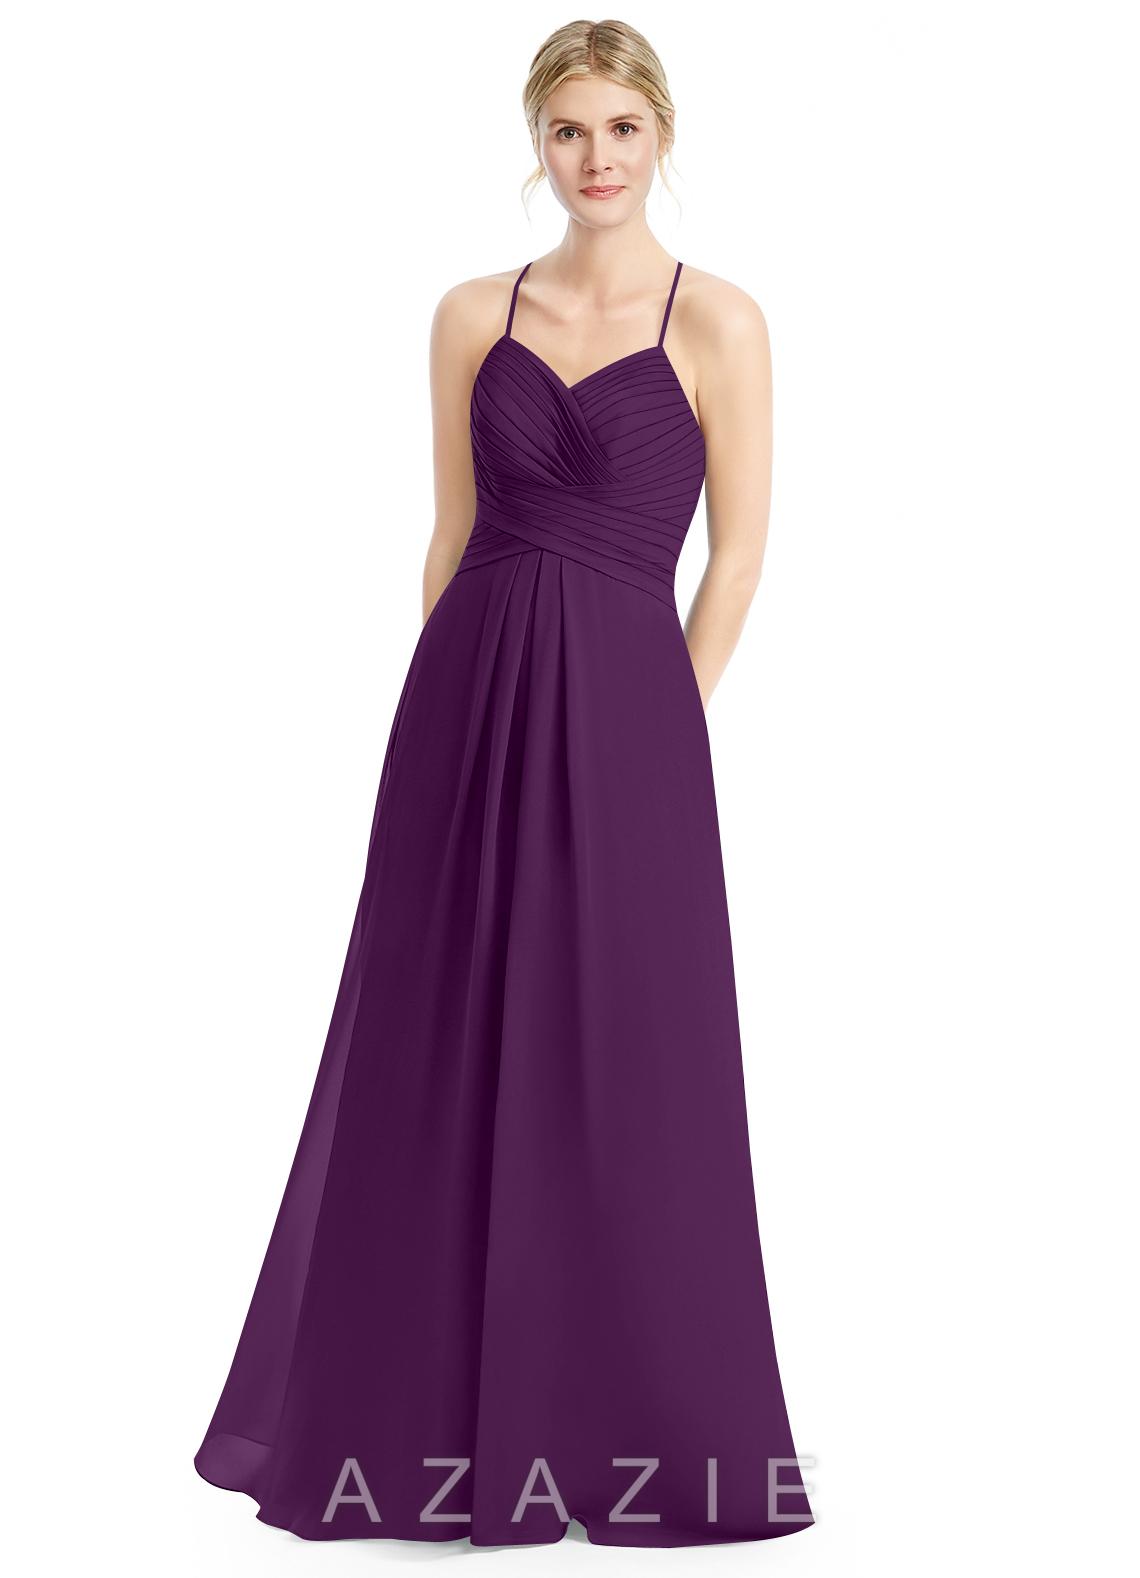 Azazie cecilia bridesmaid dress azazie loading zoom ombrellifo Image collections